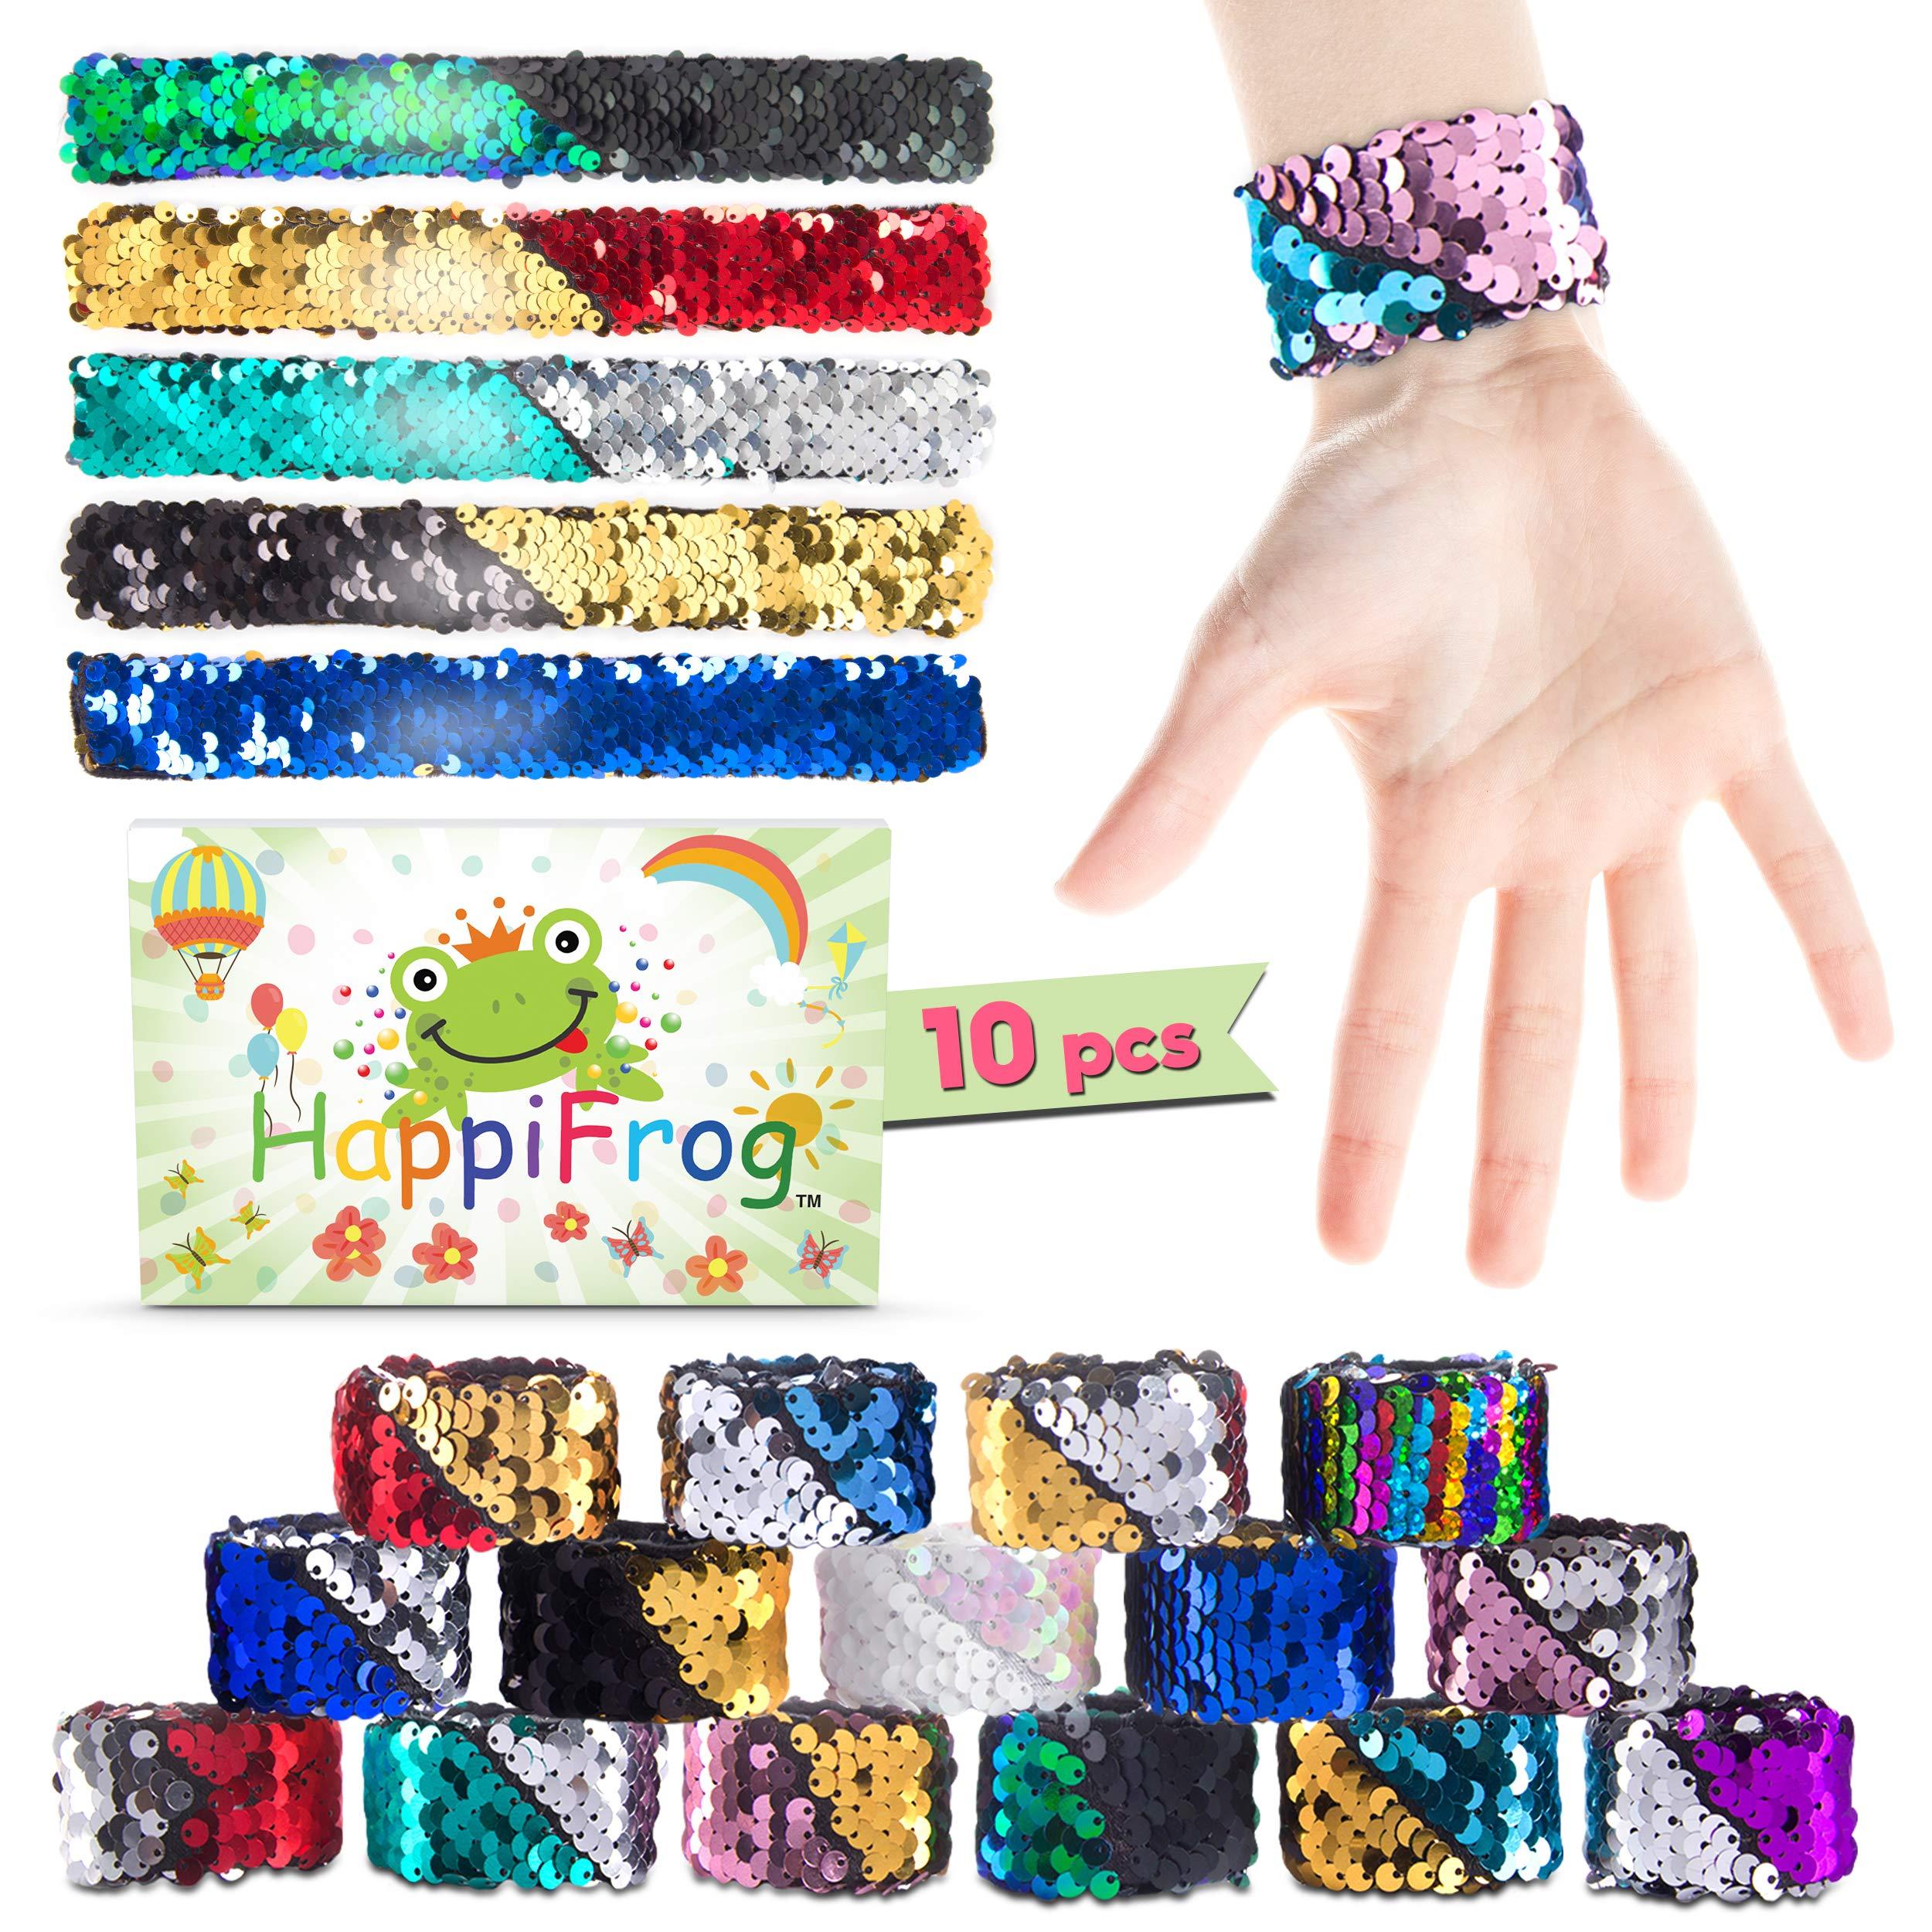 HappiFrog Mermaid Slap Bracelets, Mermaid Party Favors for Girls, Premium 10-Pack in Gift Box, Snap Bracelets Kids, Mermaid Favors for Party Bag Fillers, Reversible Sequin Bracelet, Random Colors by HappiFrog